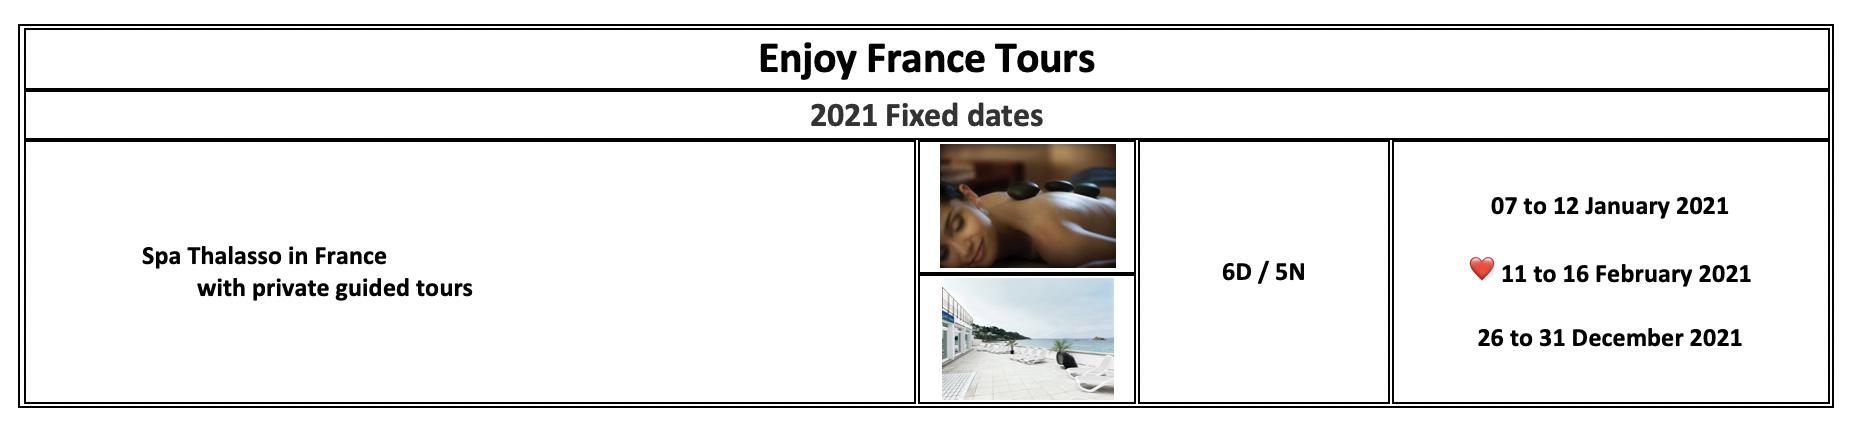 Enjoy France Tours 2021 Spa Thalasso